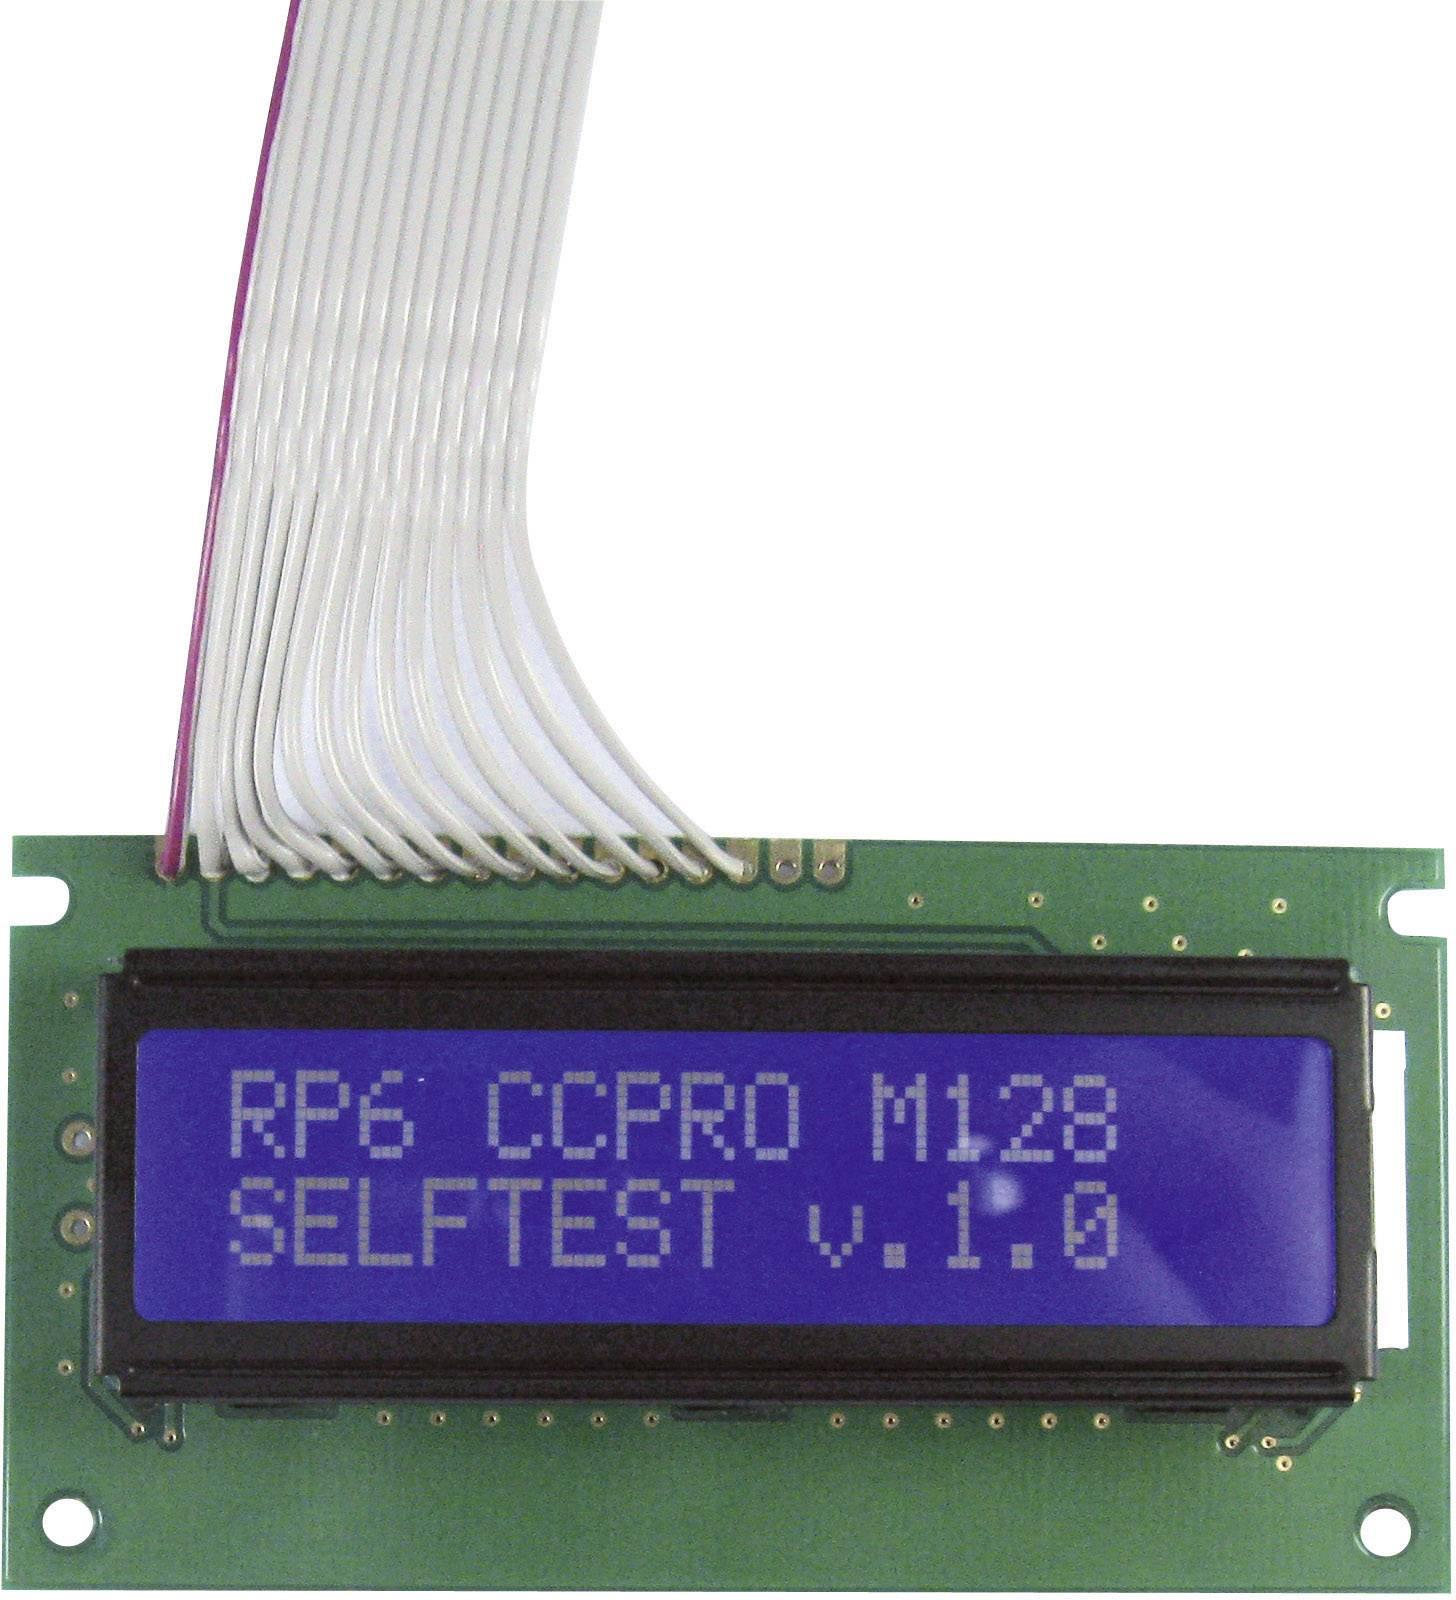 Displej RP-DSP88 pre robota Arexx Asura RP5/FP6